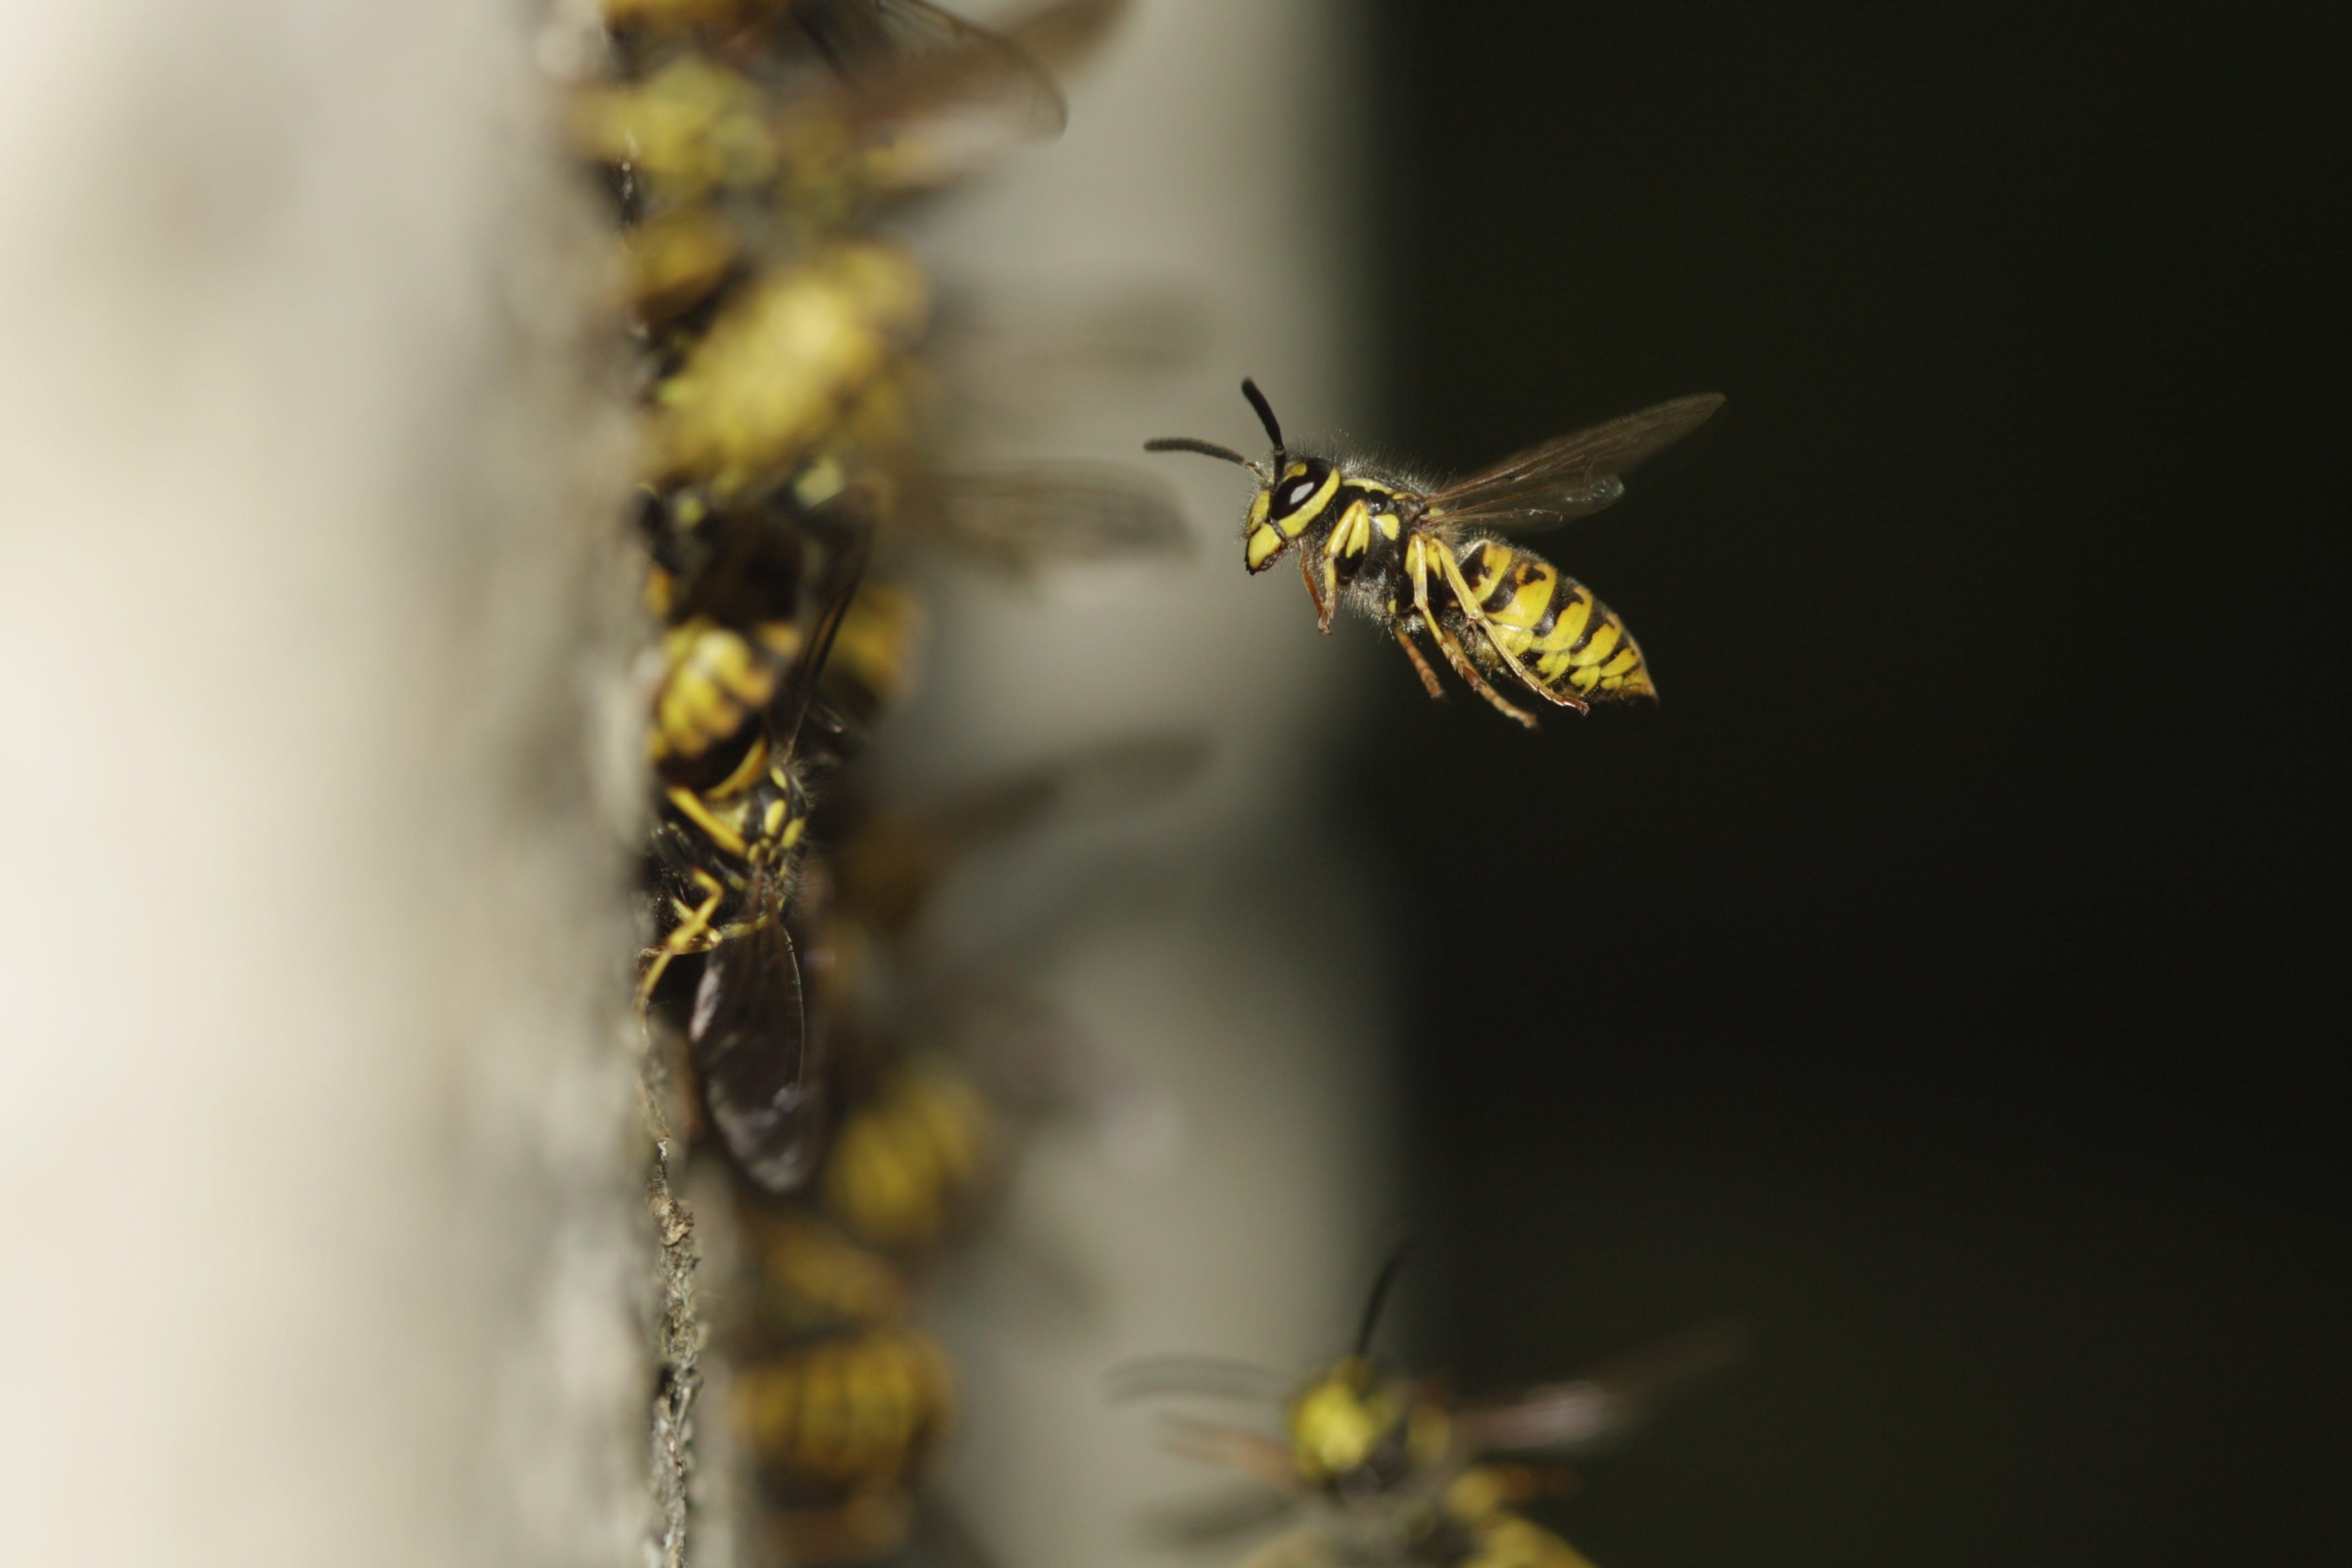 Free stock photo of yellow, black, insect, macro